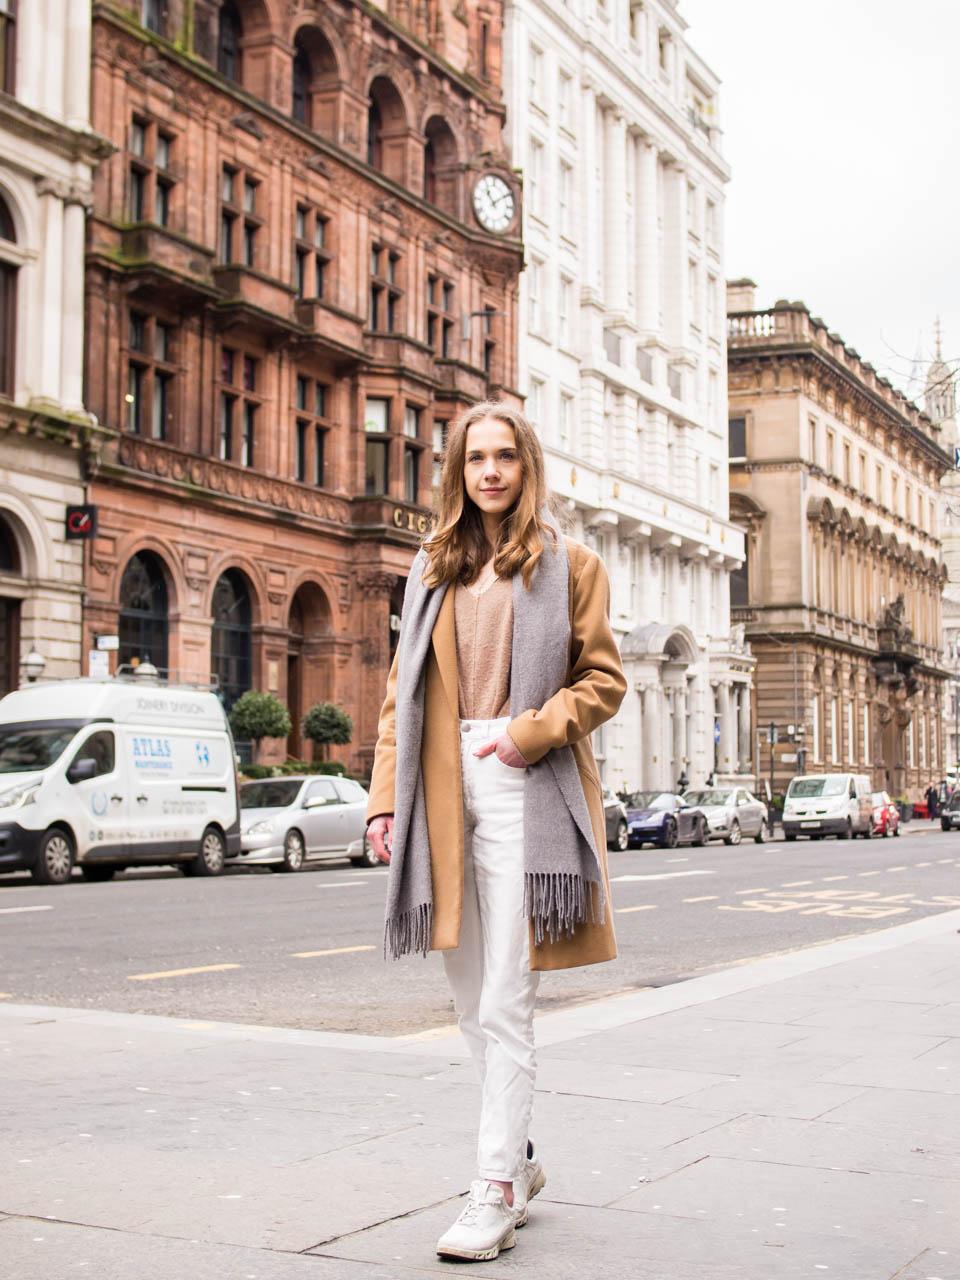 Neutraali asuinspiraatio: valkoiset farkut, beige neule ja kamelitakki // Neutral outfit: white jeans, beige knit and camel coat